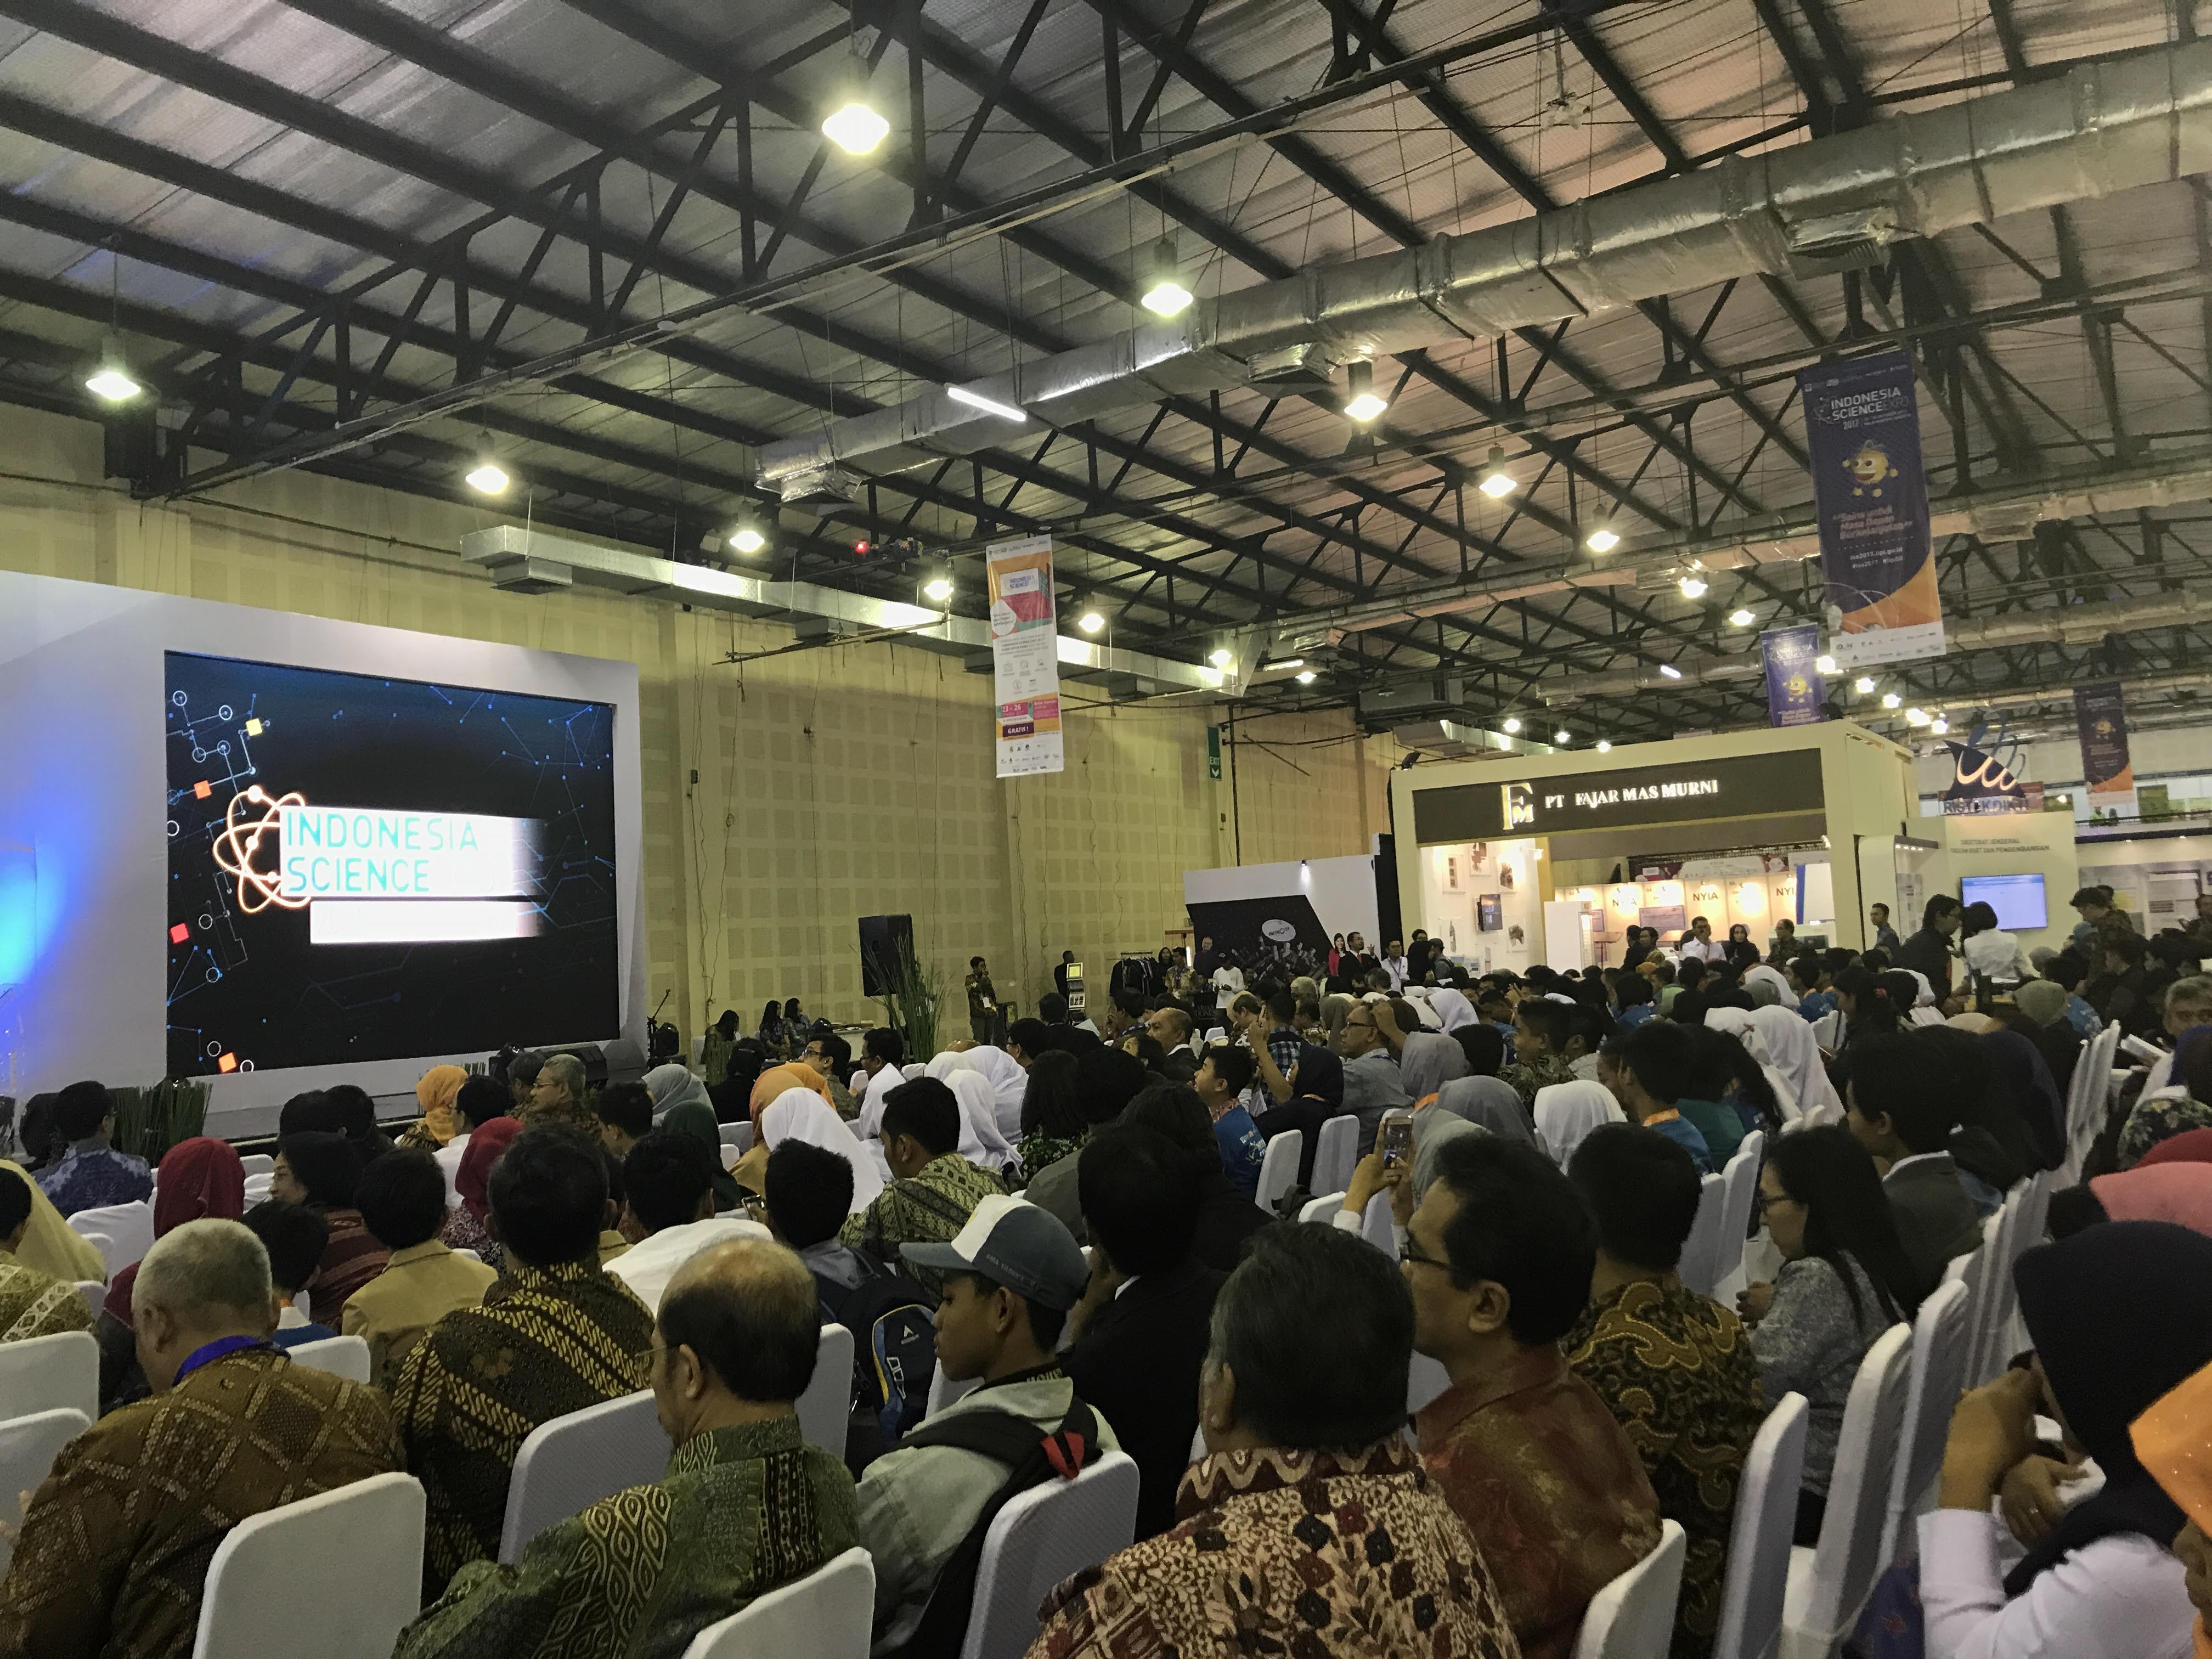 LIPI Kembali Gelar Indonesia Science Expo